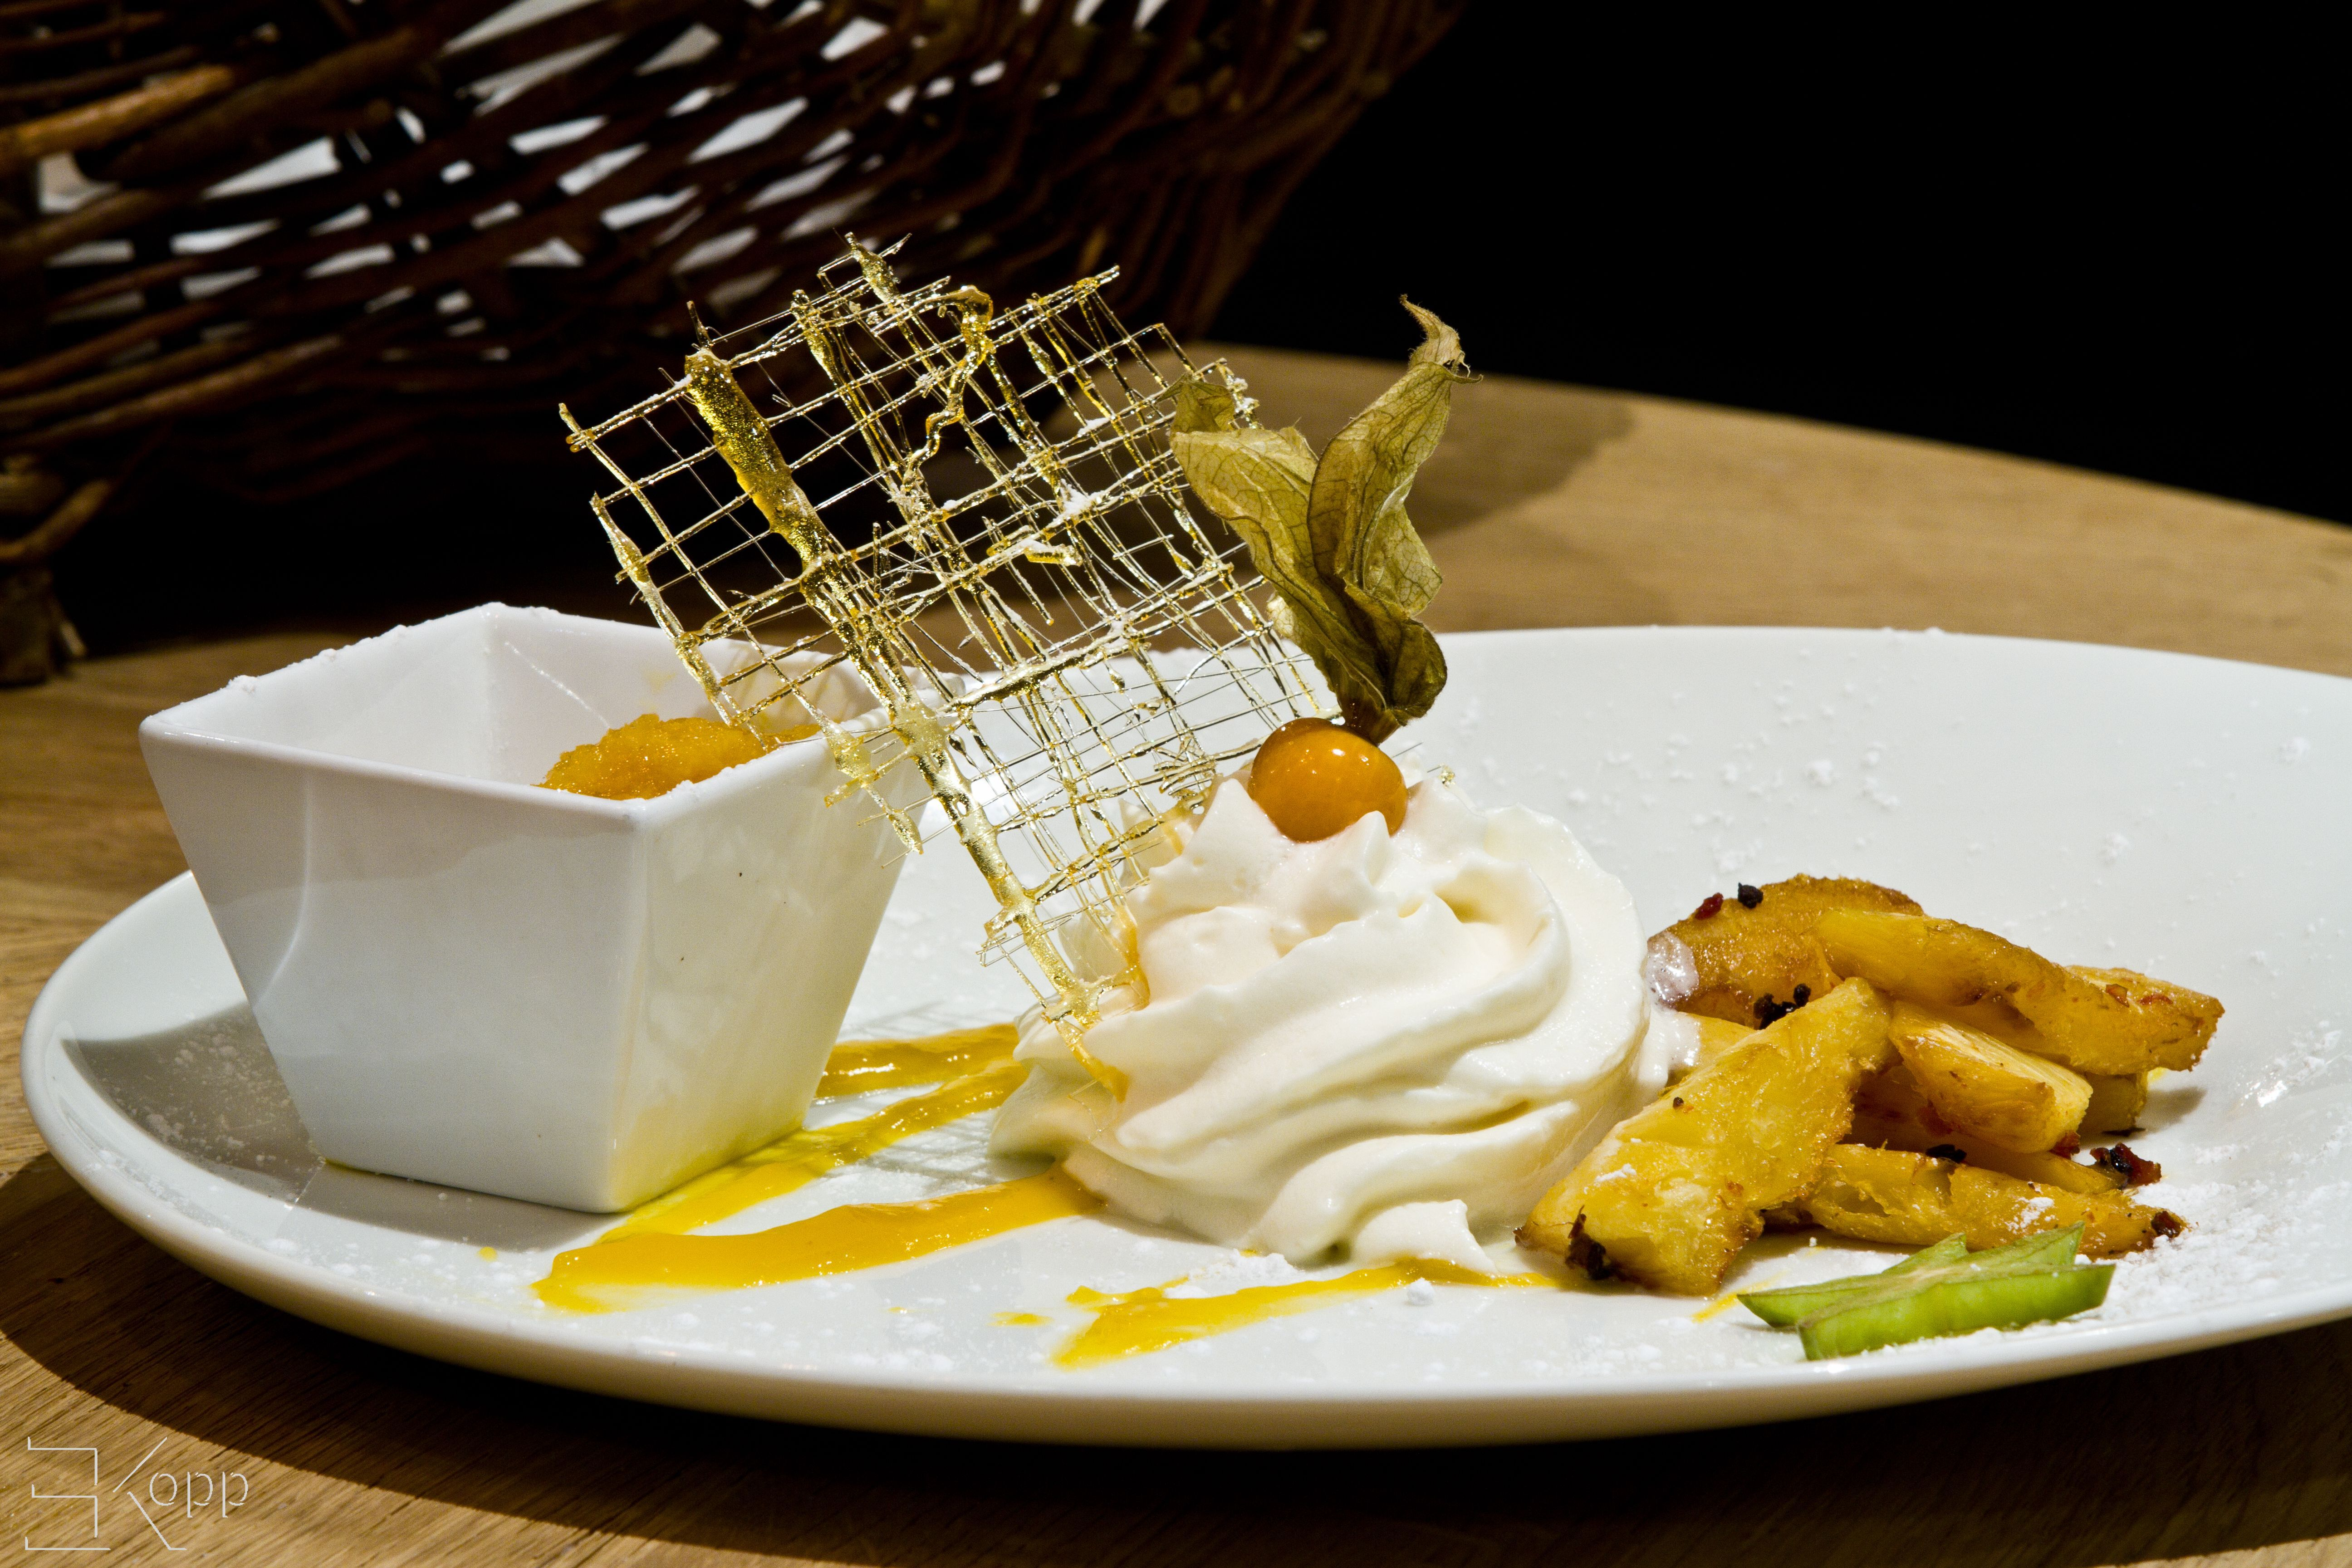 Cuisine gastronomique restaurant strasbourg du cot de - Blog cuisine gastronomique ...